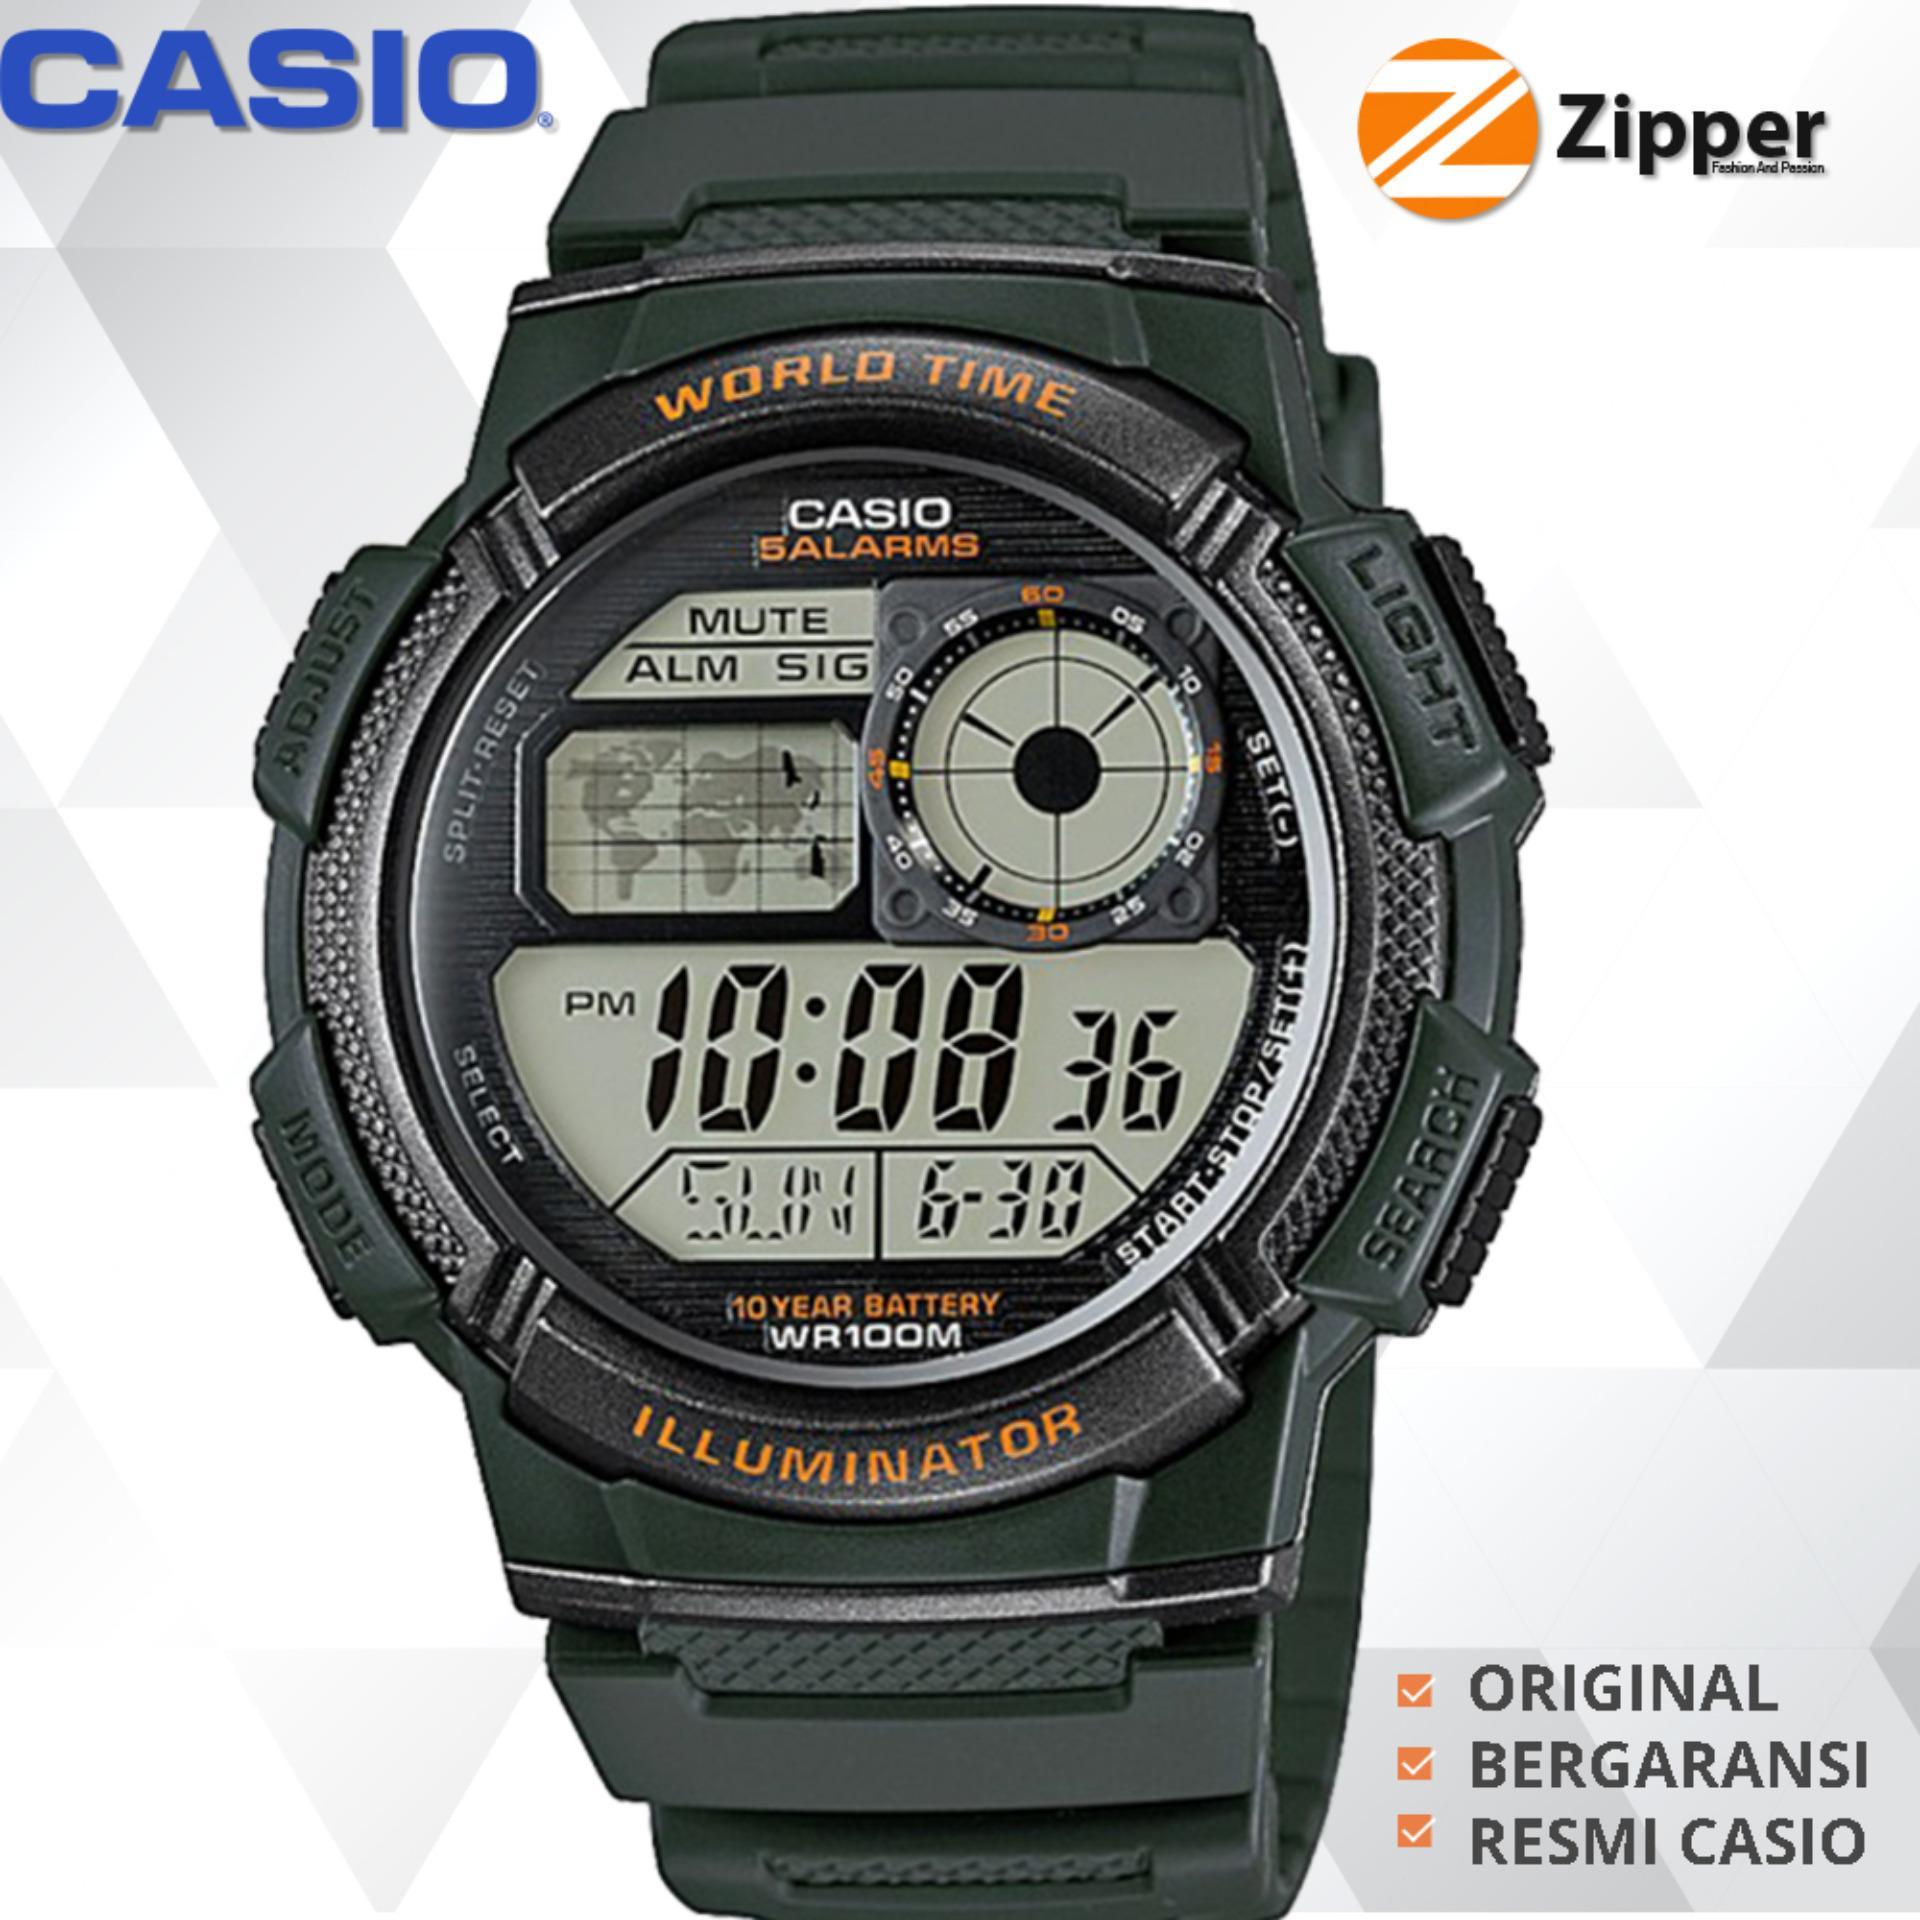 Casio Illuminator Jam Tangan Digital Men and Women AE-1000W Youth Series -  Tali Karet 520ef702d2